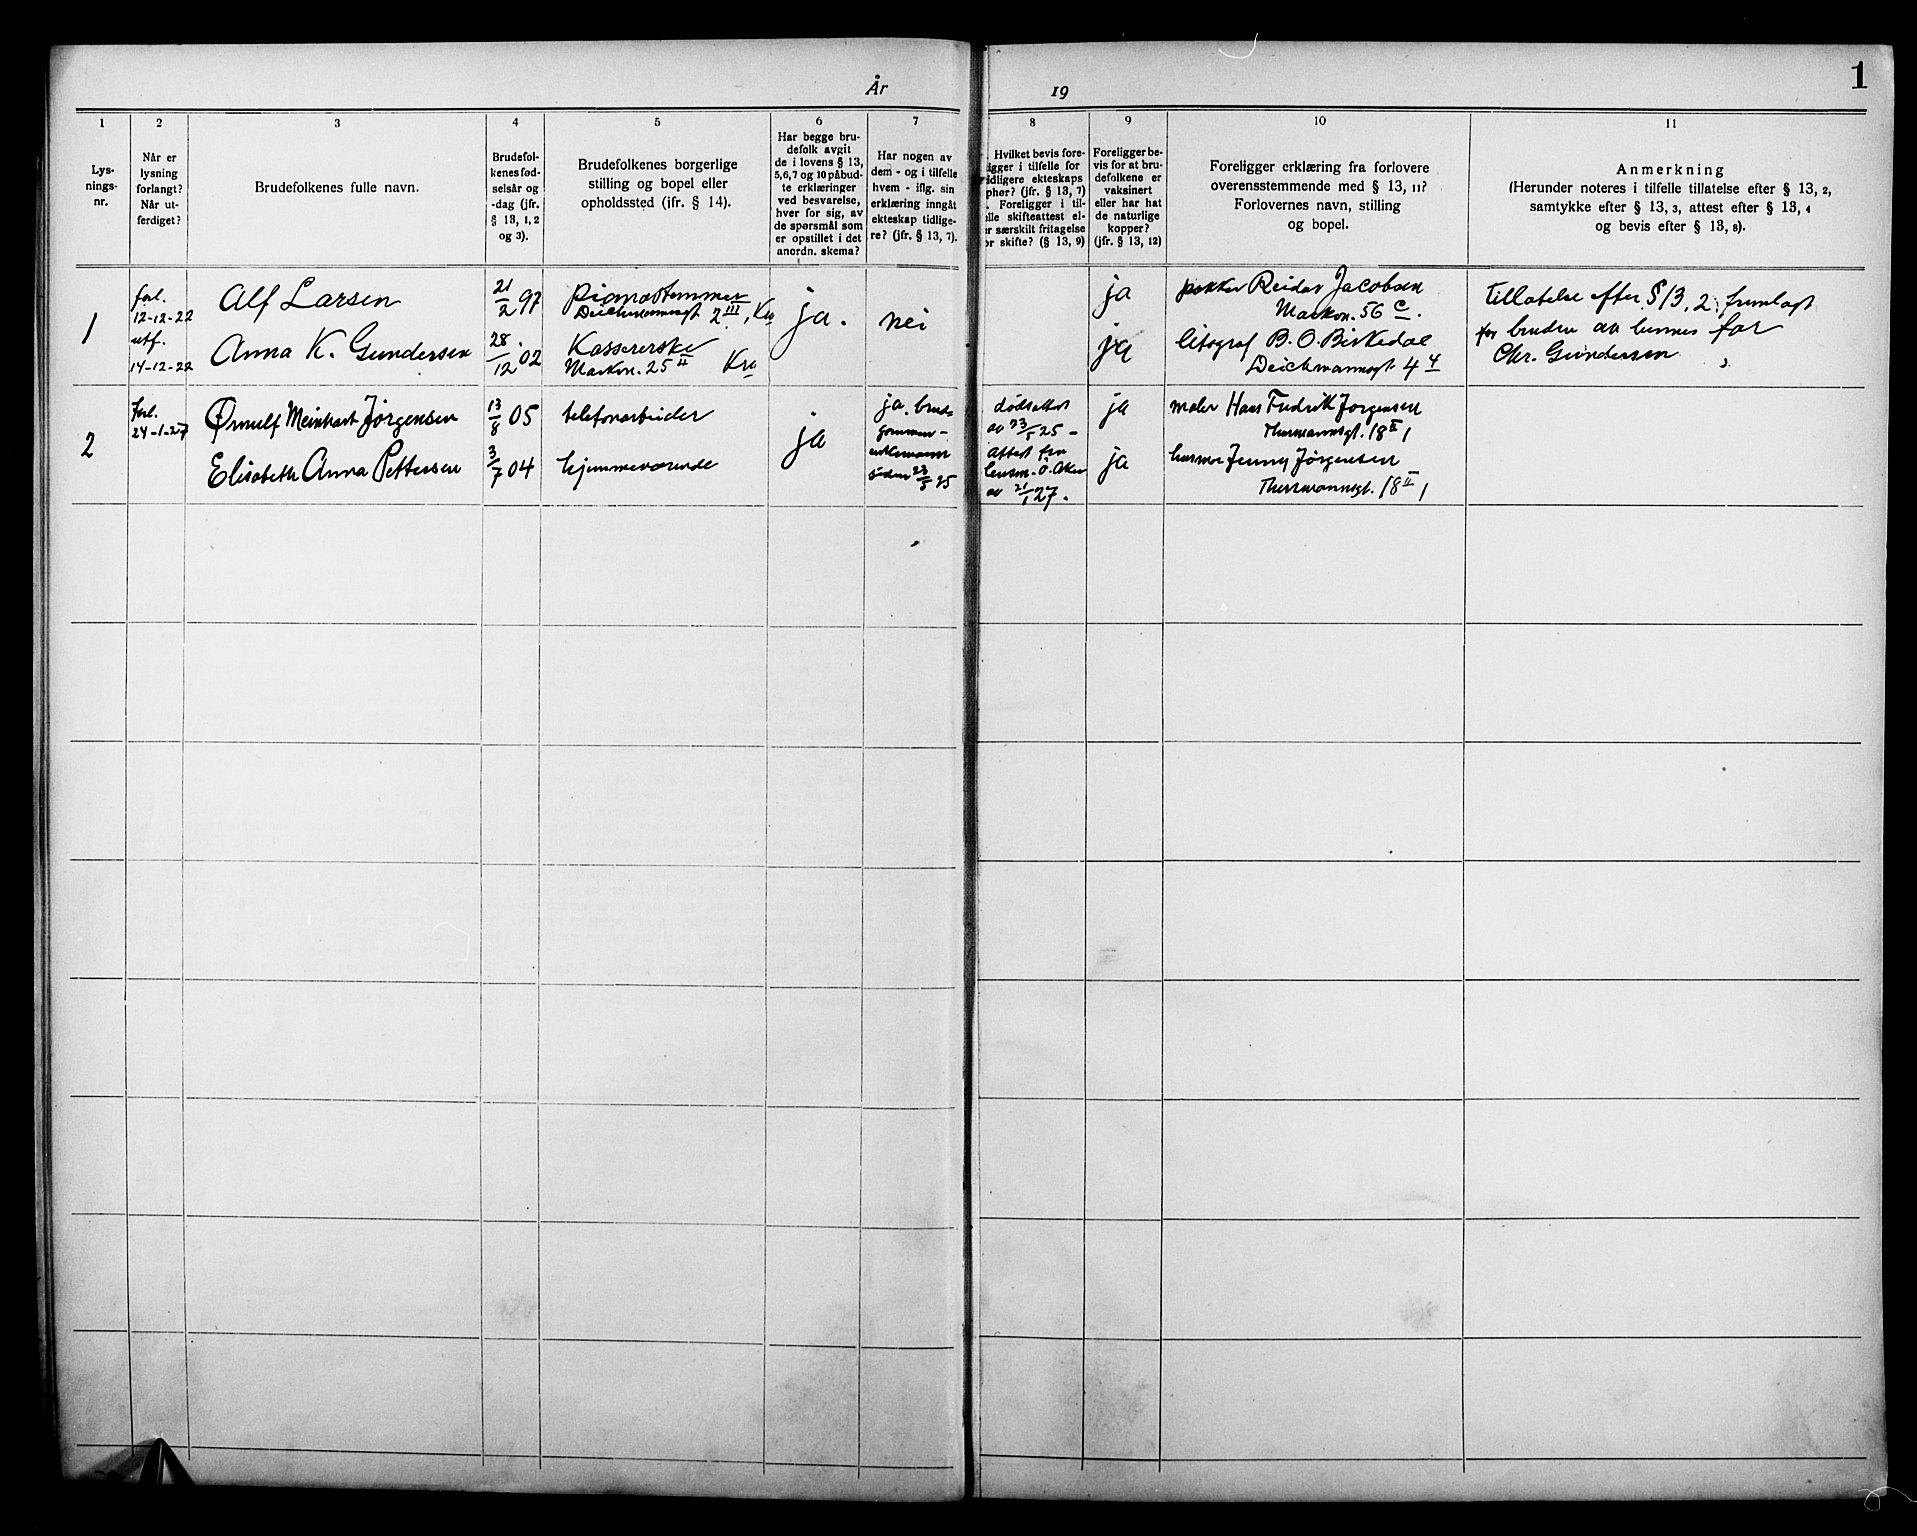 SAO, Broderskapets kirke Oslo , D/L0001: Marriage register (dissenter) no. 1, 1922-1927, p. 1